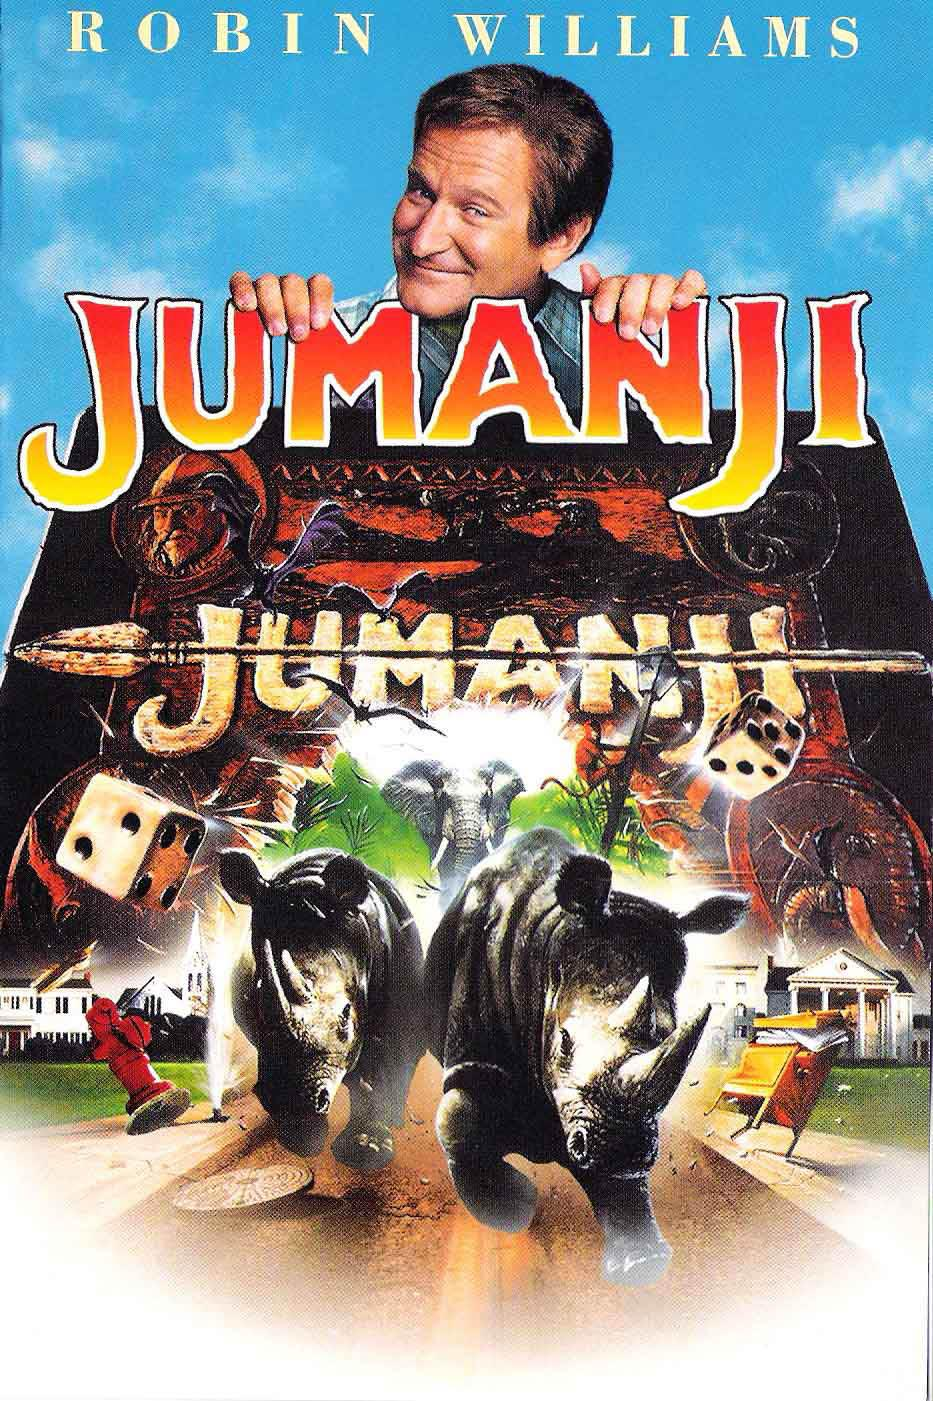 Imagens Jumanji 1 Torrent Dublado 1080p 720p BluRay (1995) Download